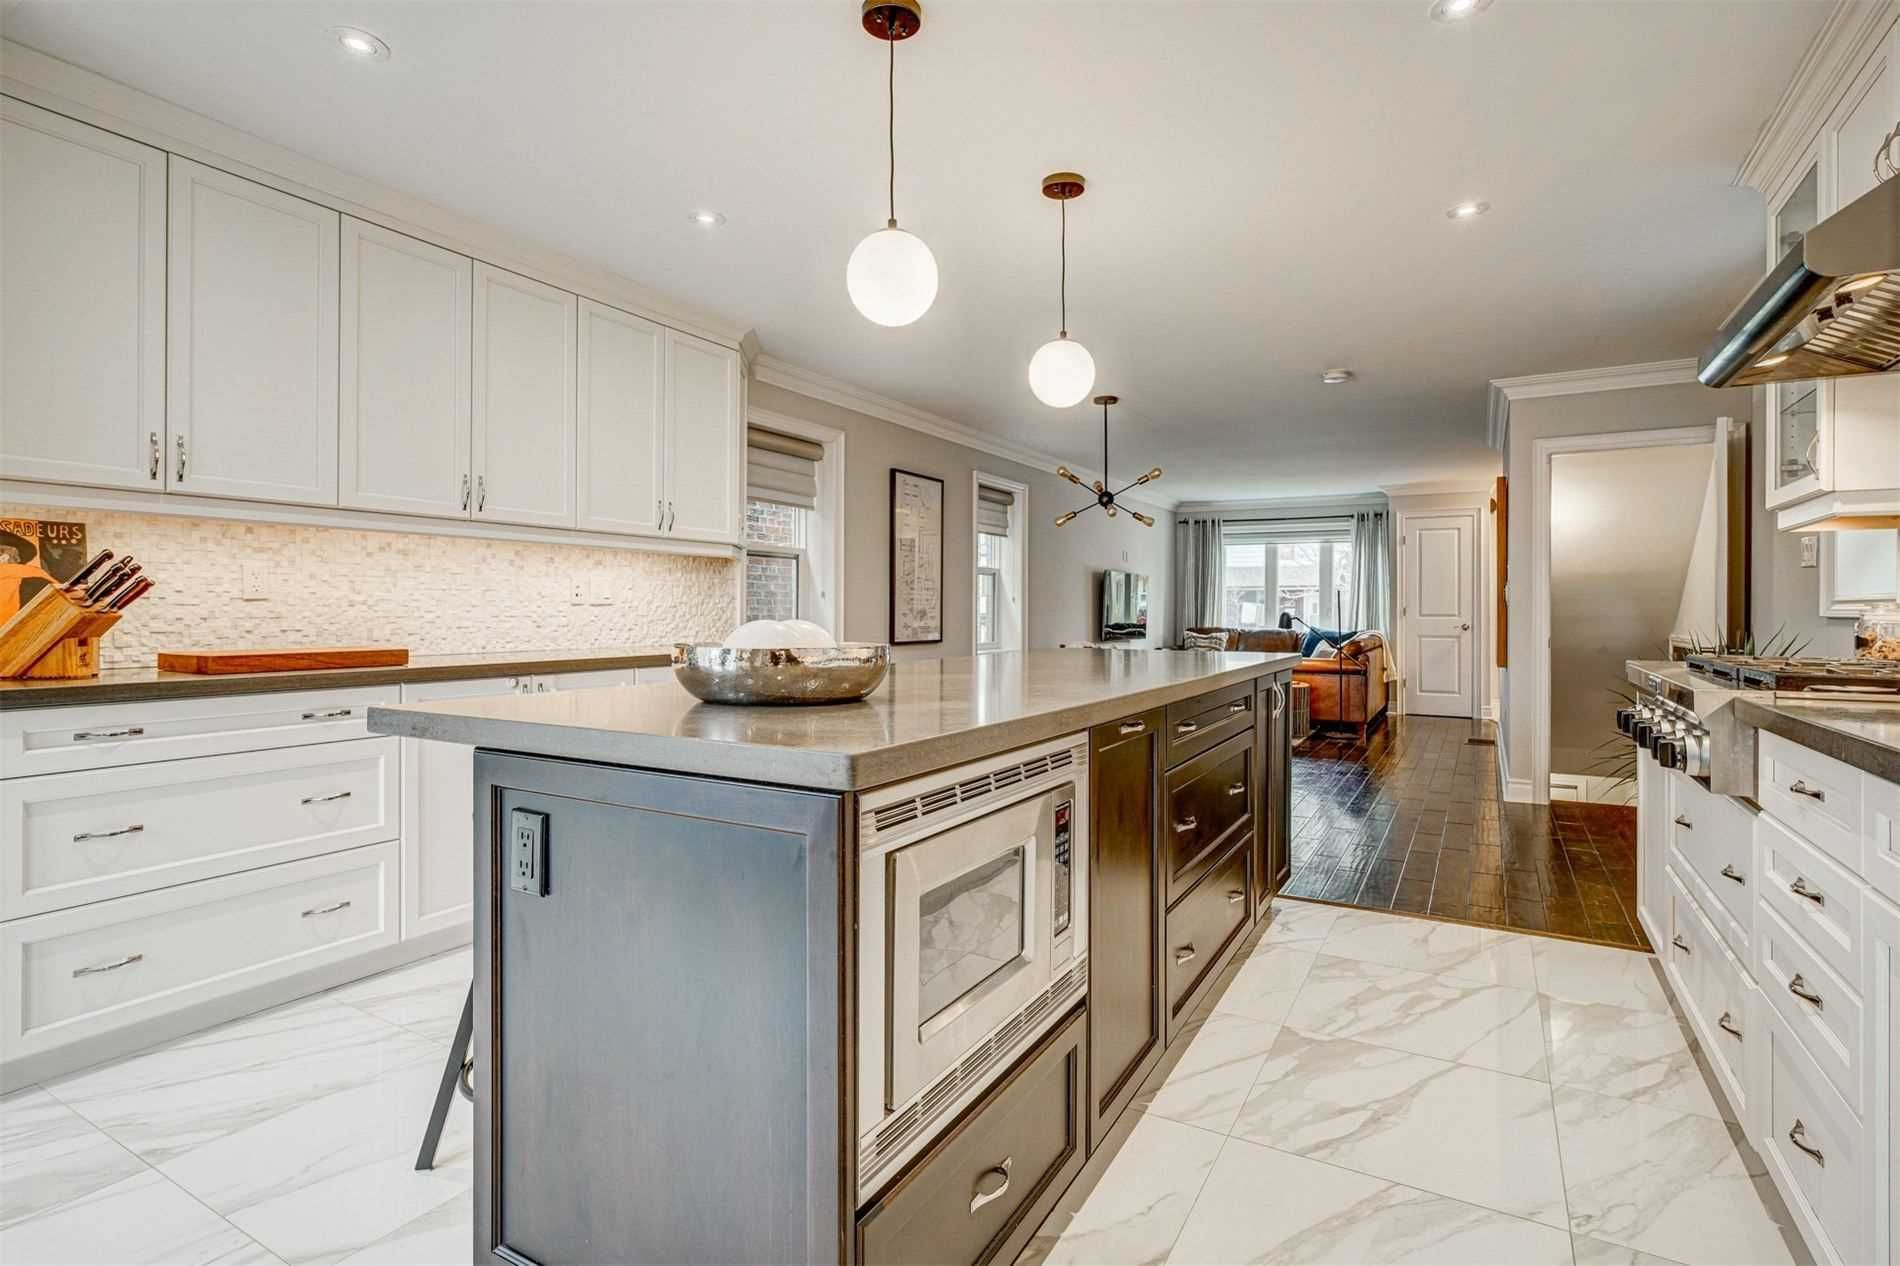 Photo 13: Photos: 92 Holborne Avenue in Toronto: Danforth Village-East York House (2-Storey) for sale (Toronto E03)  : MLS®# E5204452